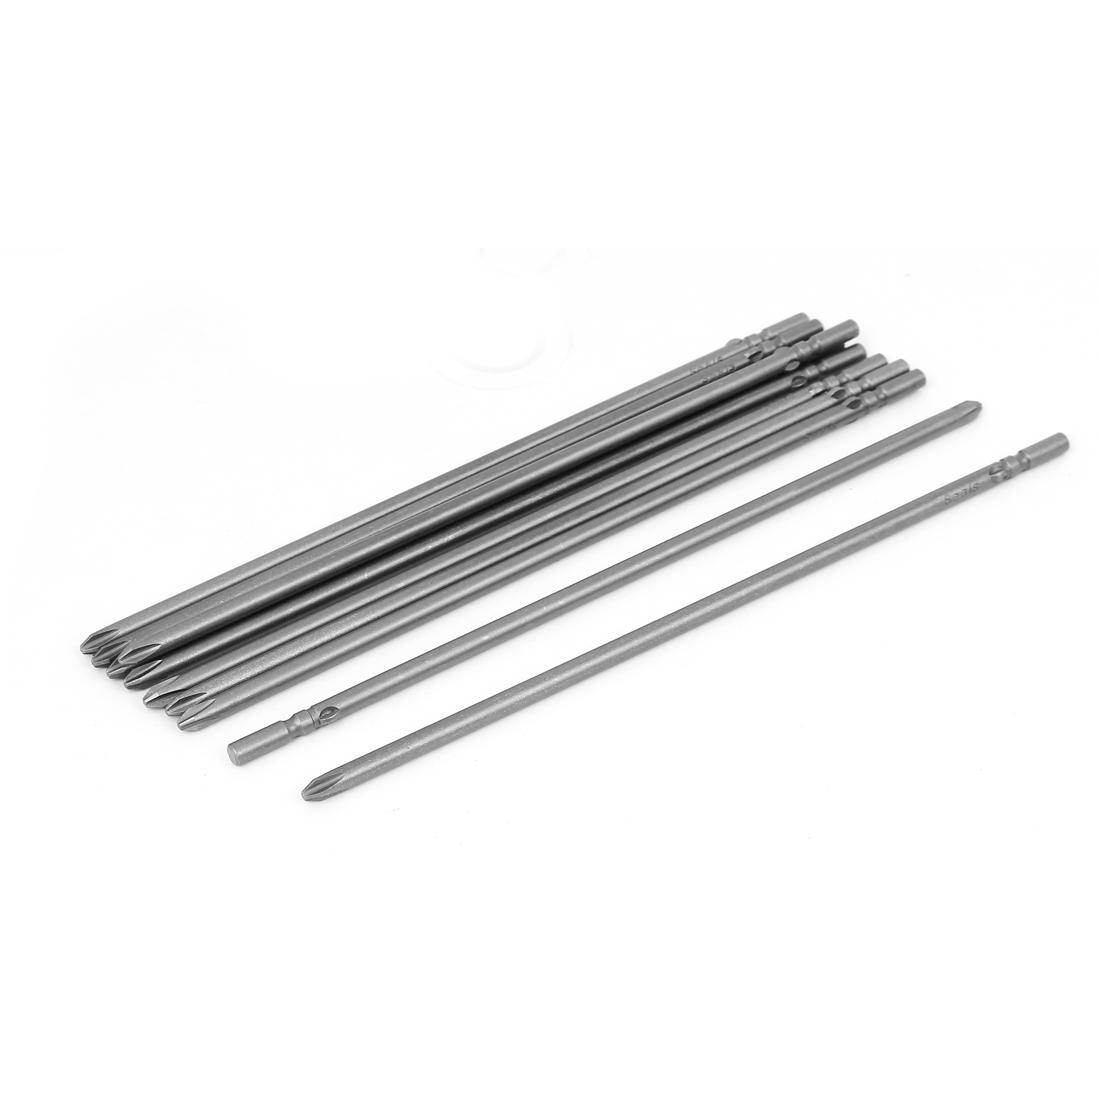 Magnetic PH2 5mm Phillips Cross Head Screwdriver Bit Tool 200mm Length 10pcs